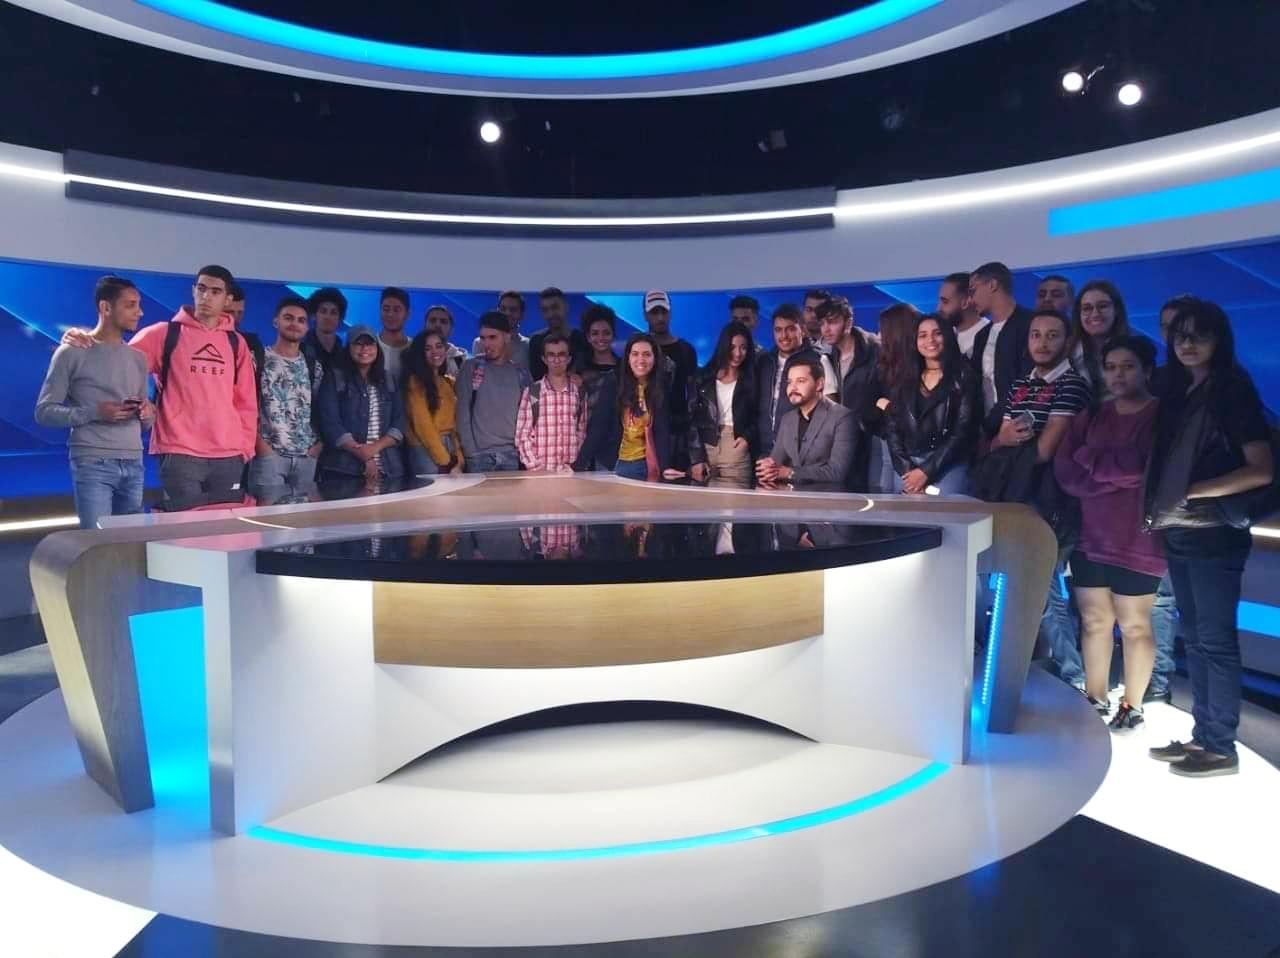 SNRT تدشن الأيام التكوينية لفائدة طلبة معاهد الصحافة والإعلام والسمعي والبصري